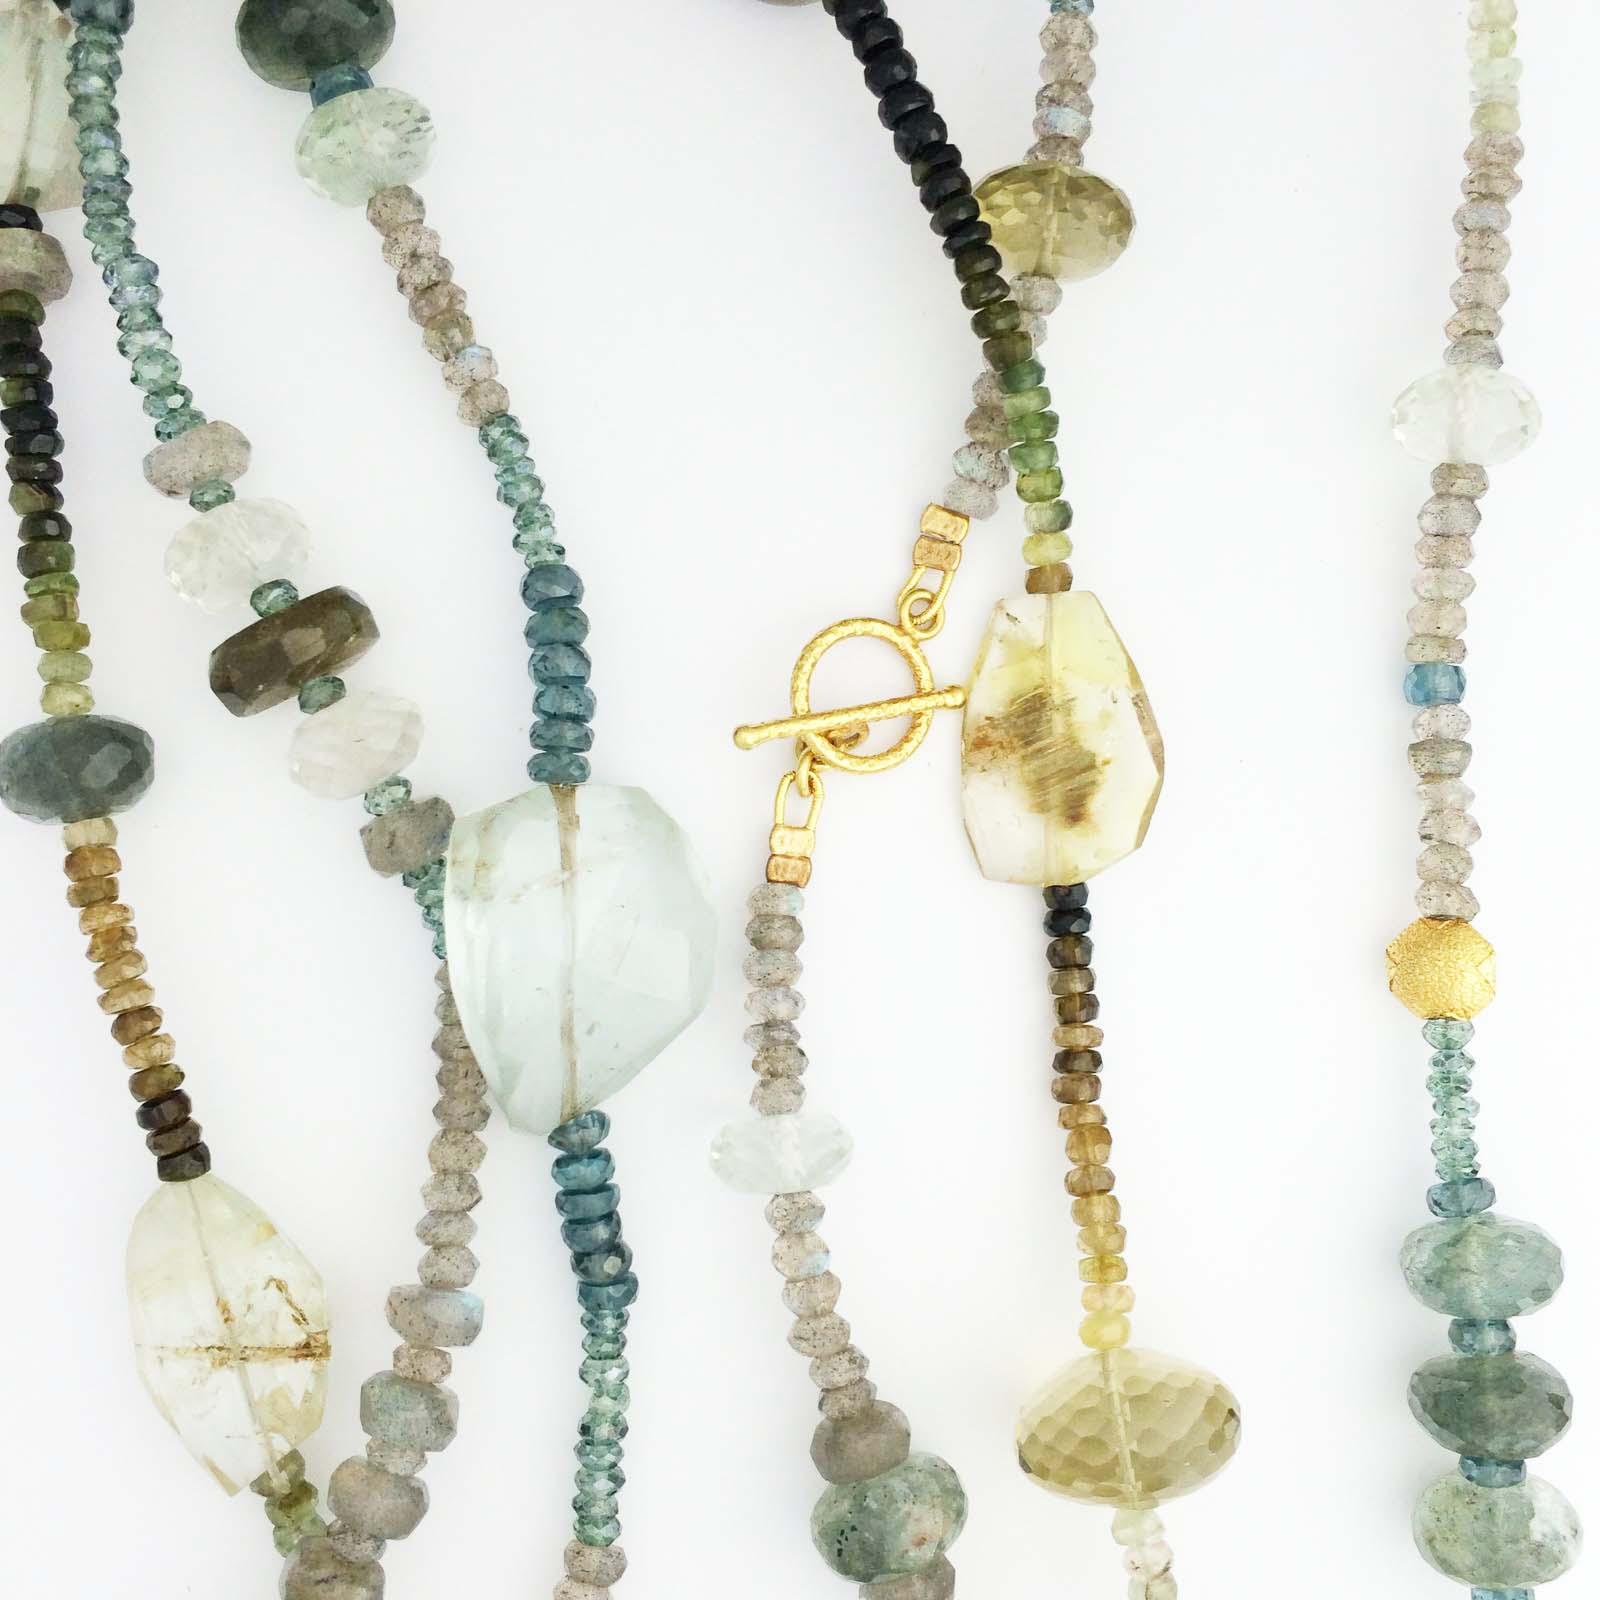 Xl multi strand necklace with various semi precious stones